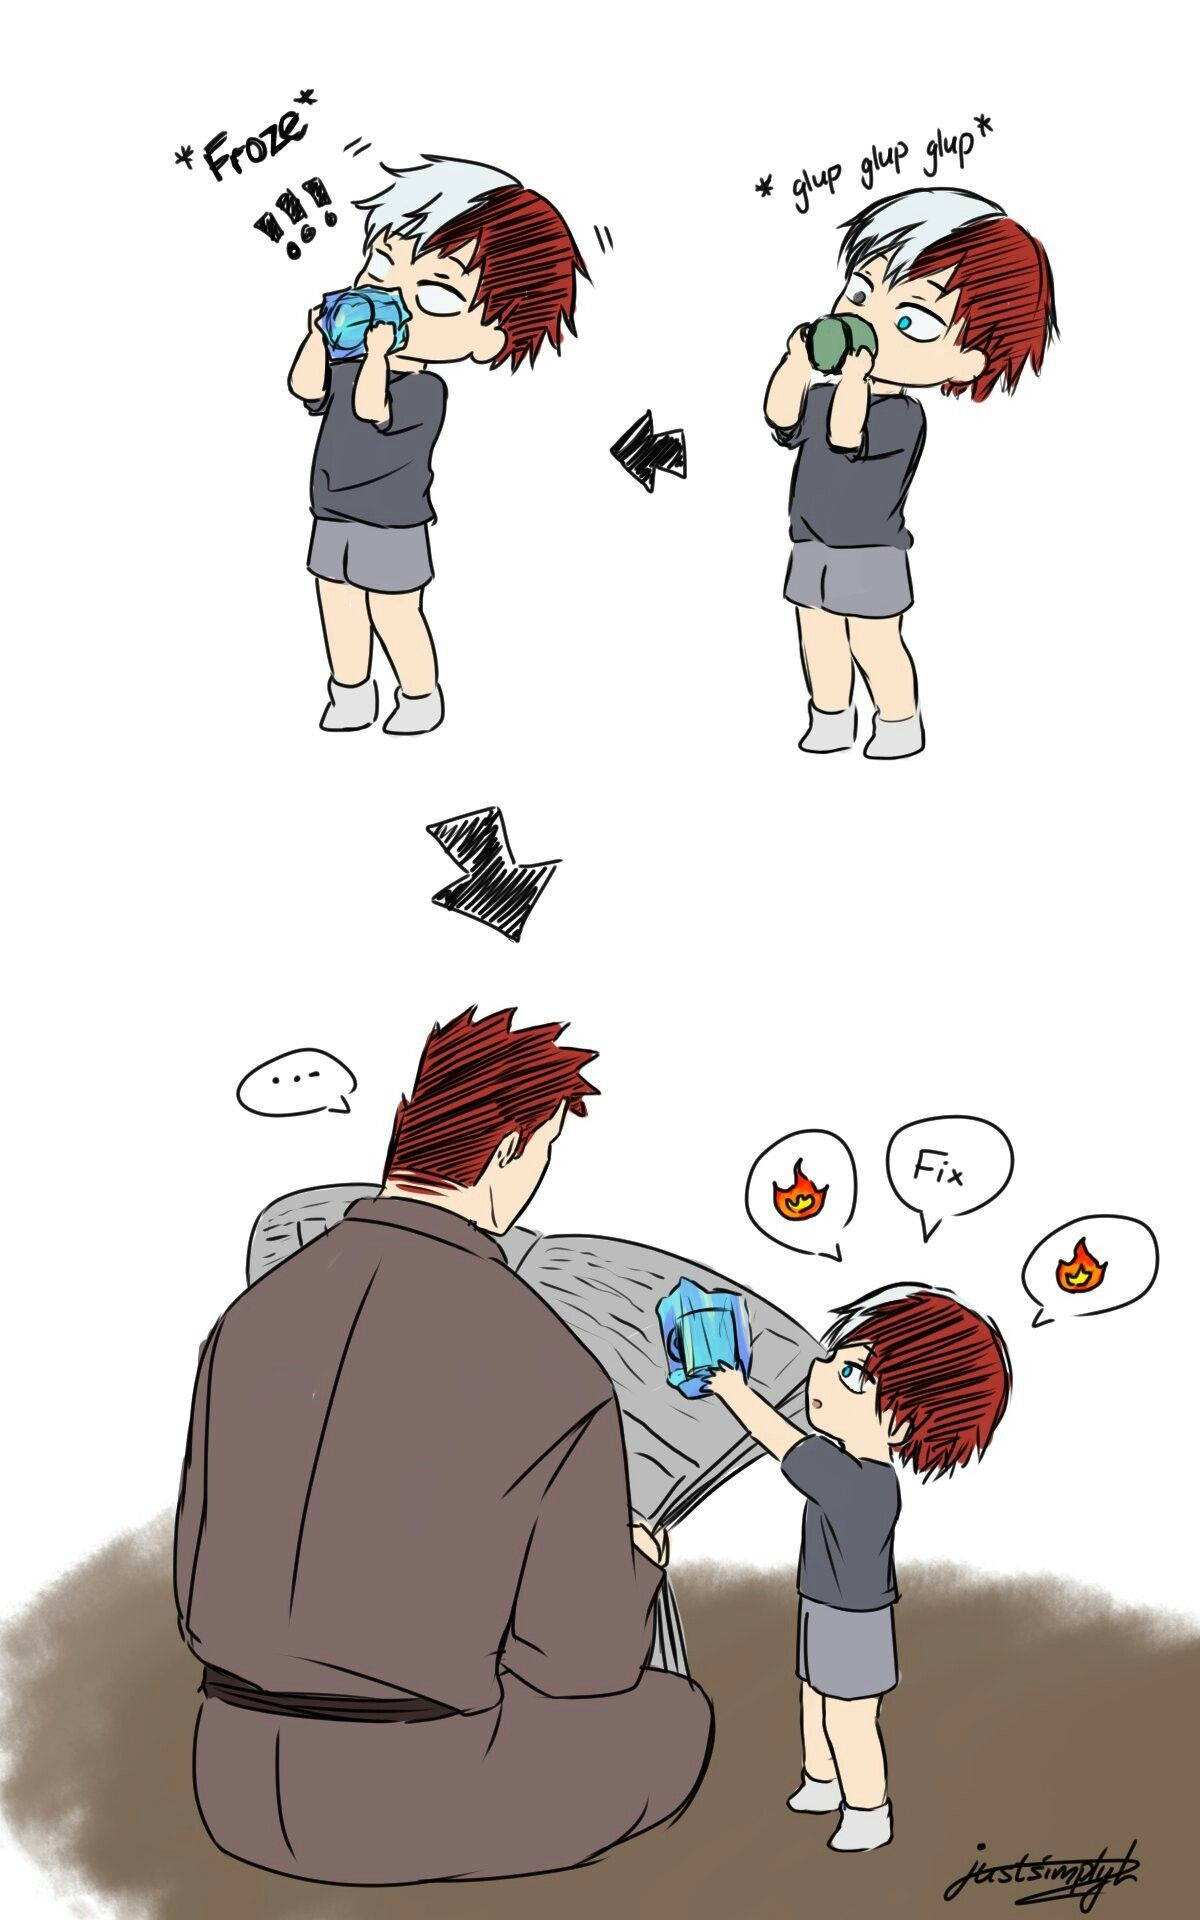 Little Shouto keeps freezing things, he then asks Enji to